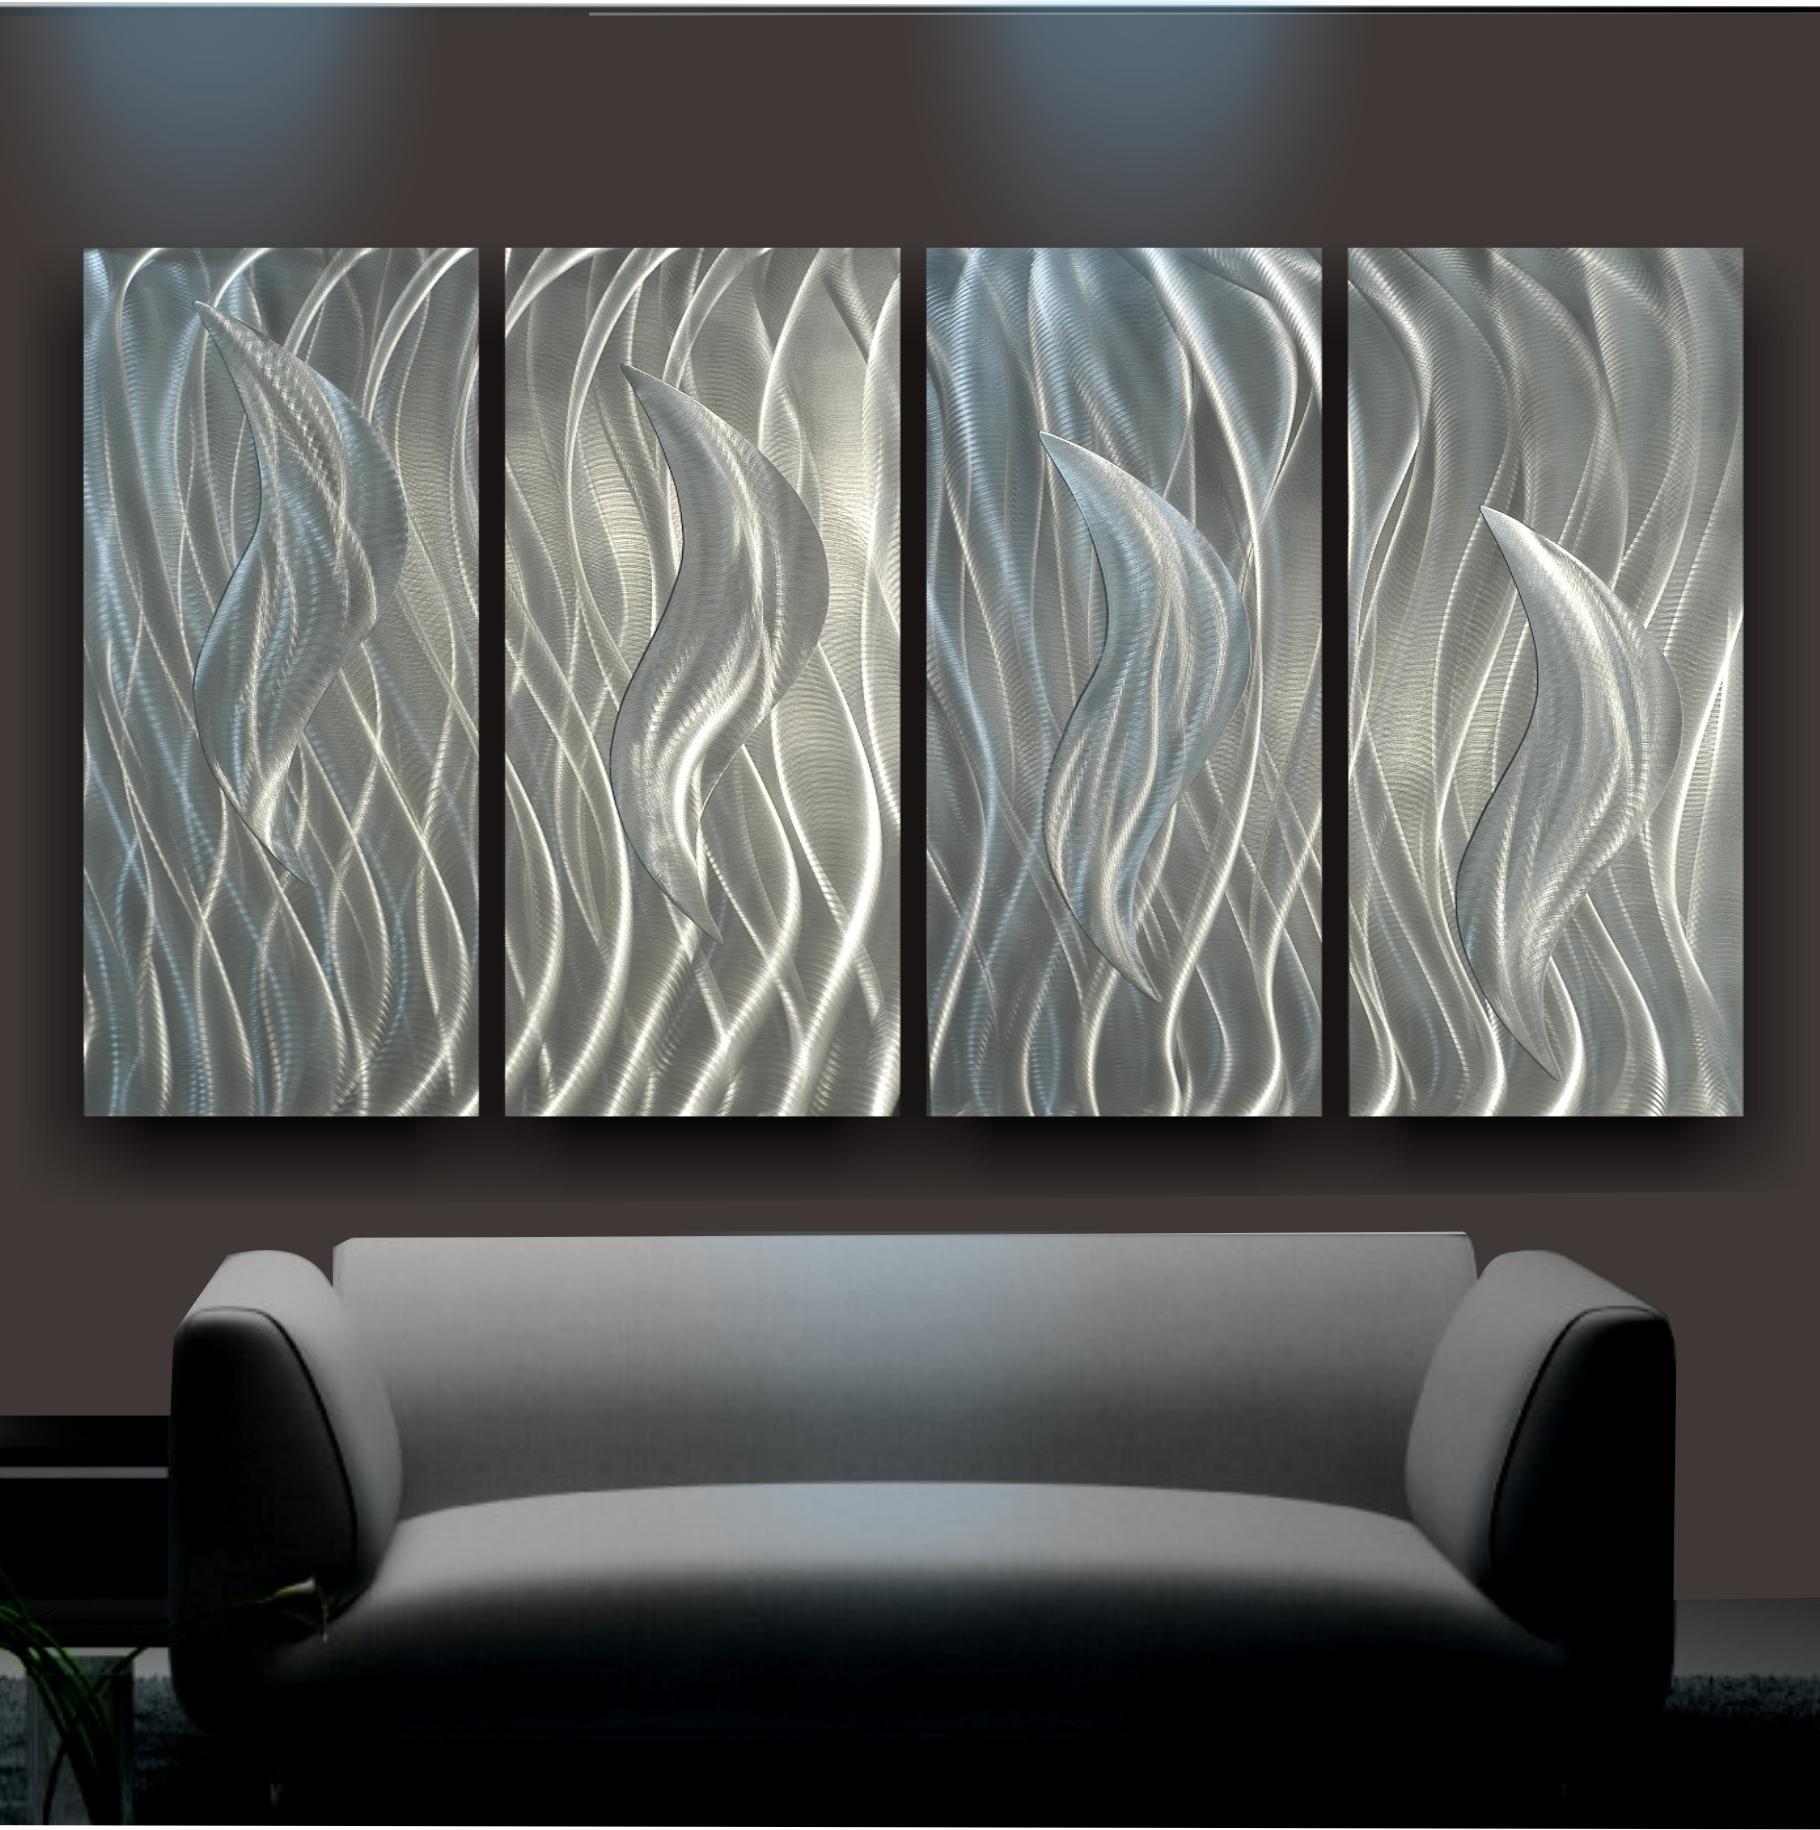 Wall Art Ideas Design : Decorative Silver Metal Art For Walls Intended For Metal Art For Walls (View 2 of 20)